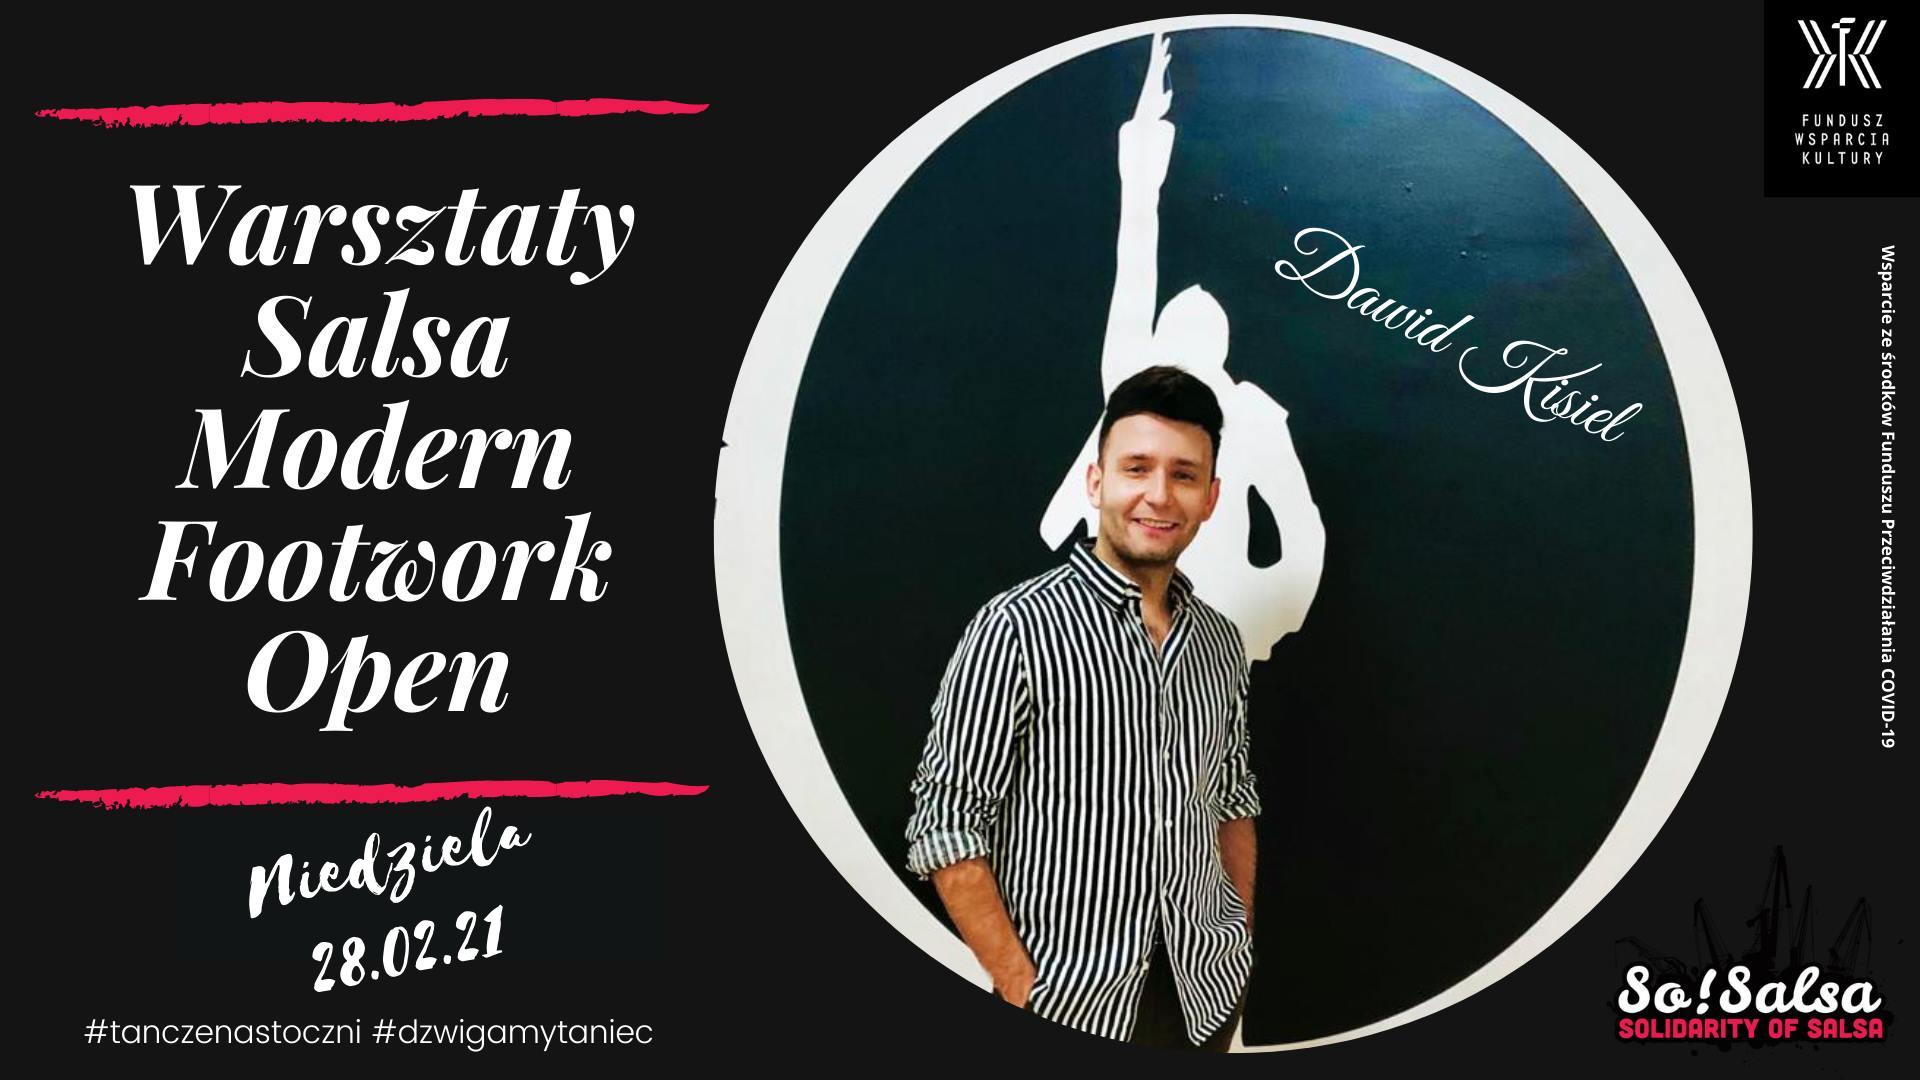 Warsztaty Salsa Modern Footwork- Dawid Kisiel w SoSalsa